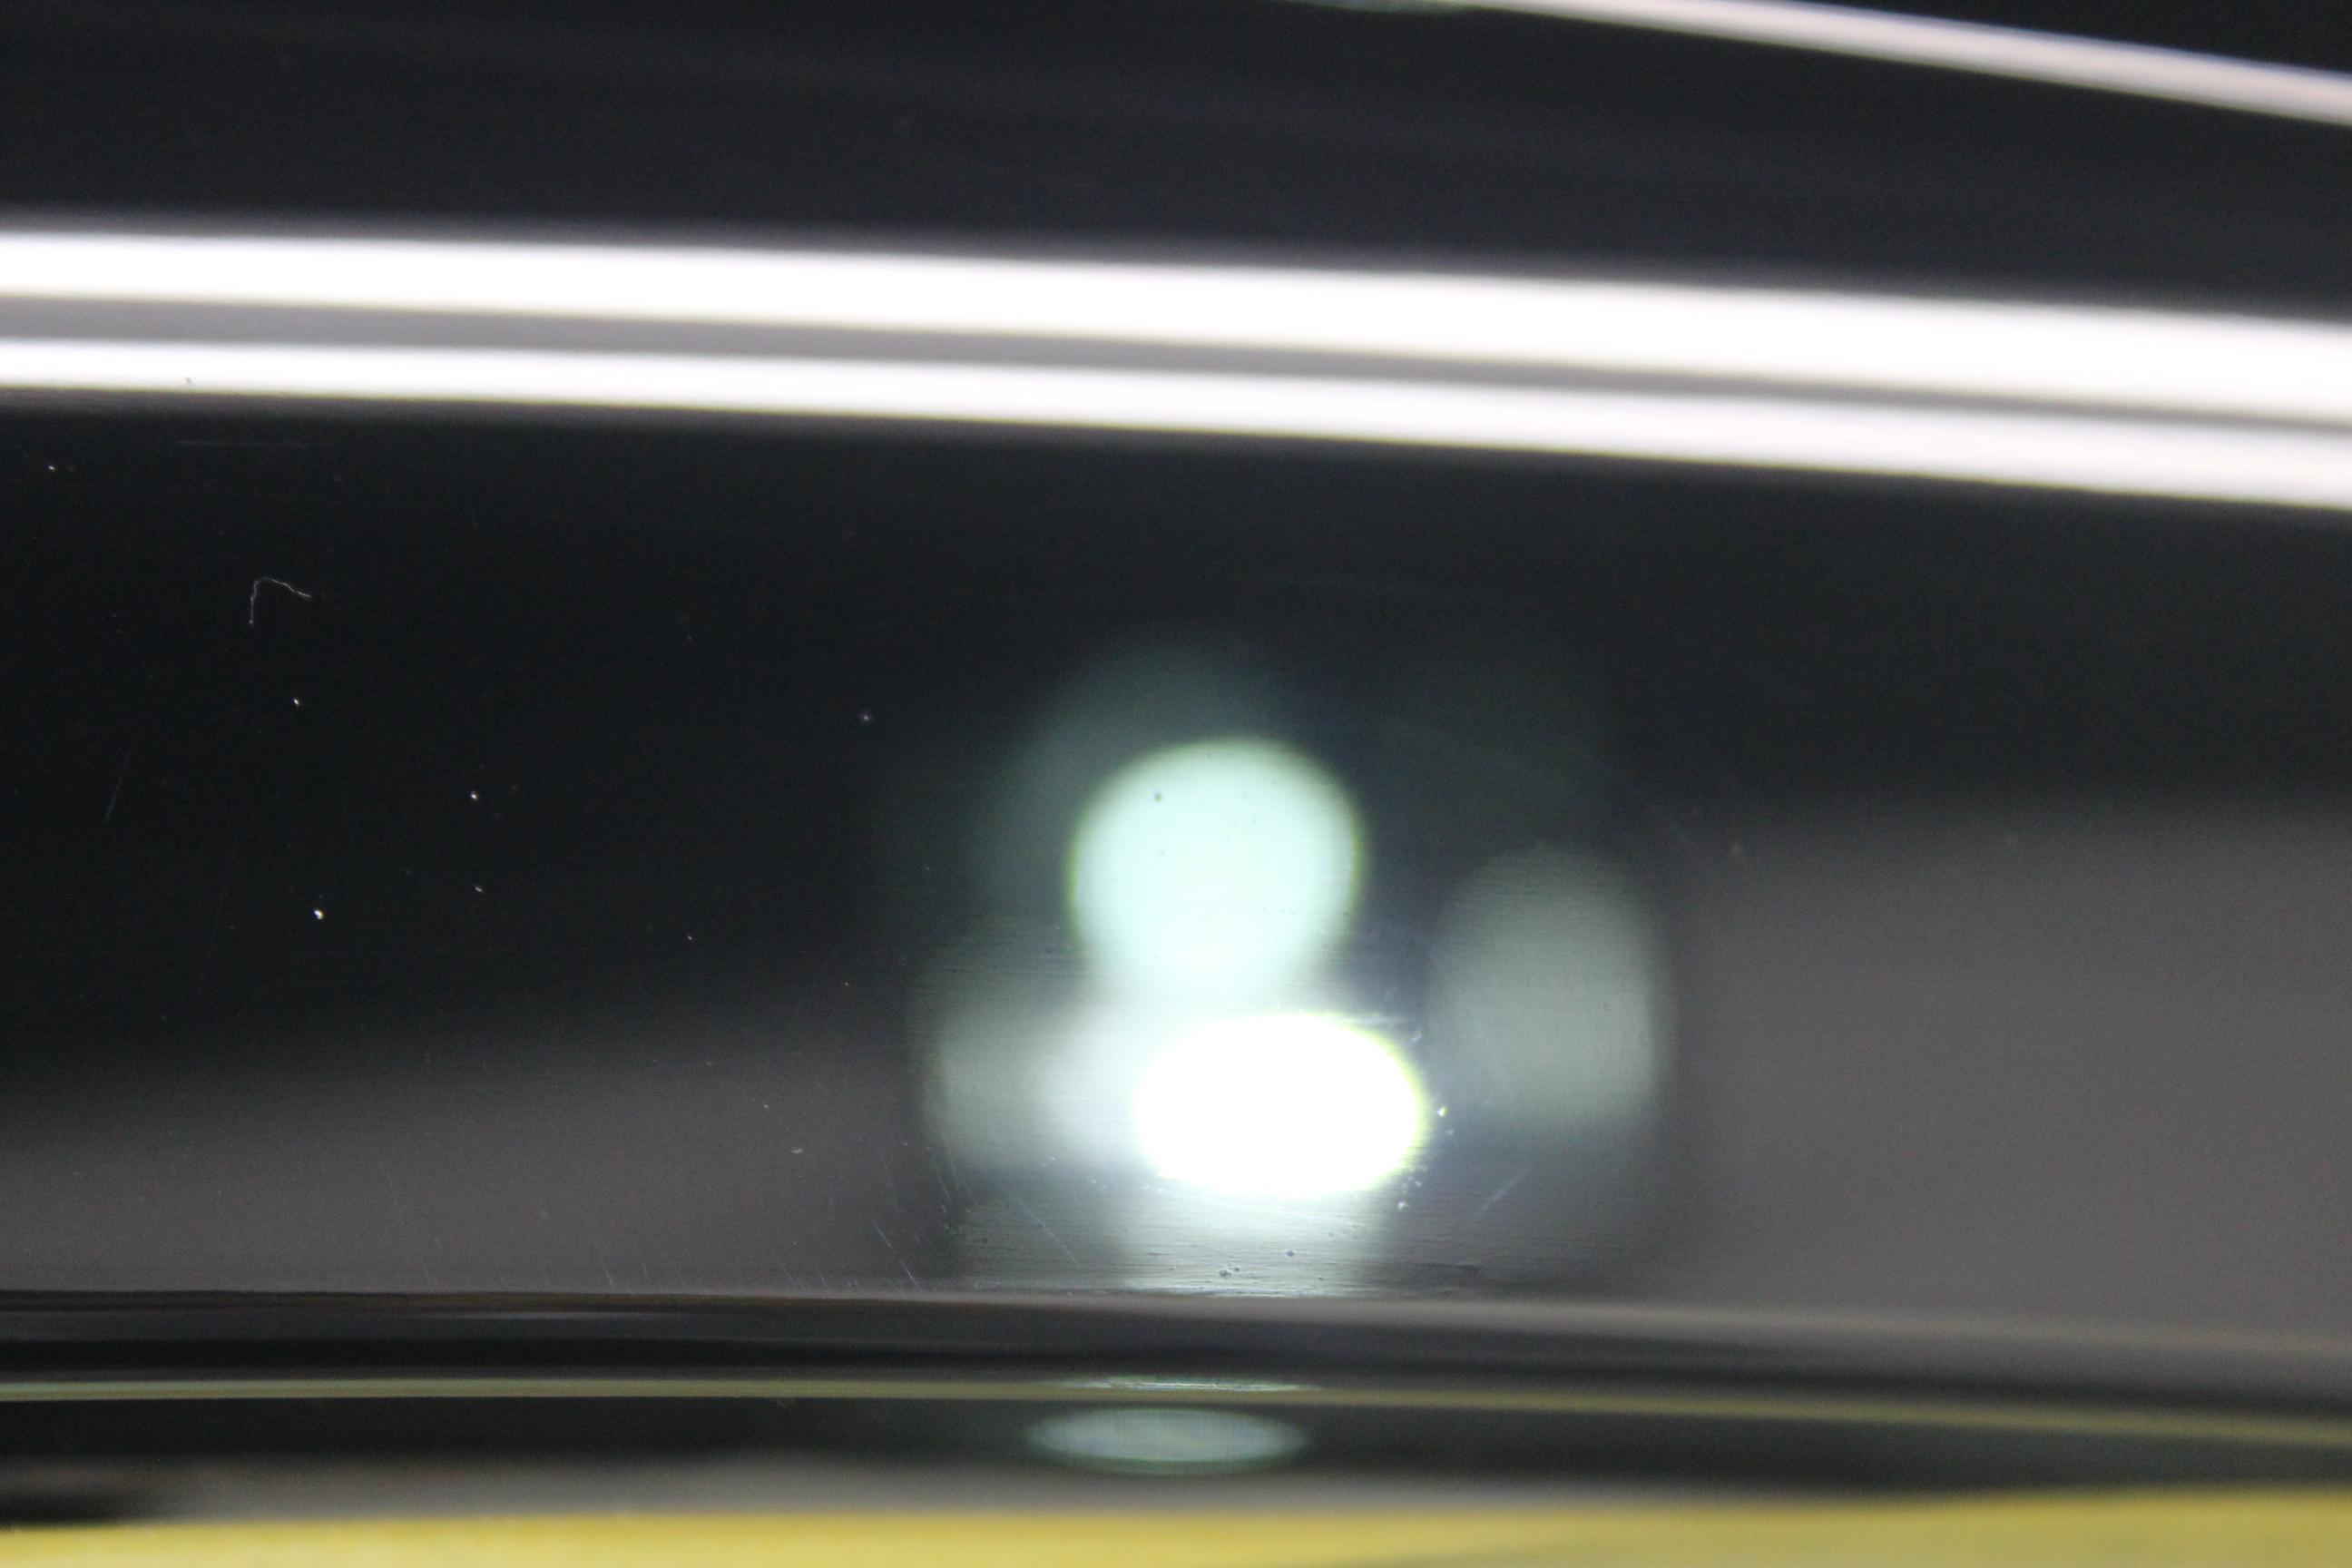 069m.jpg